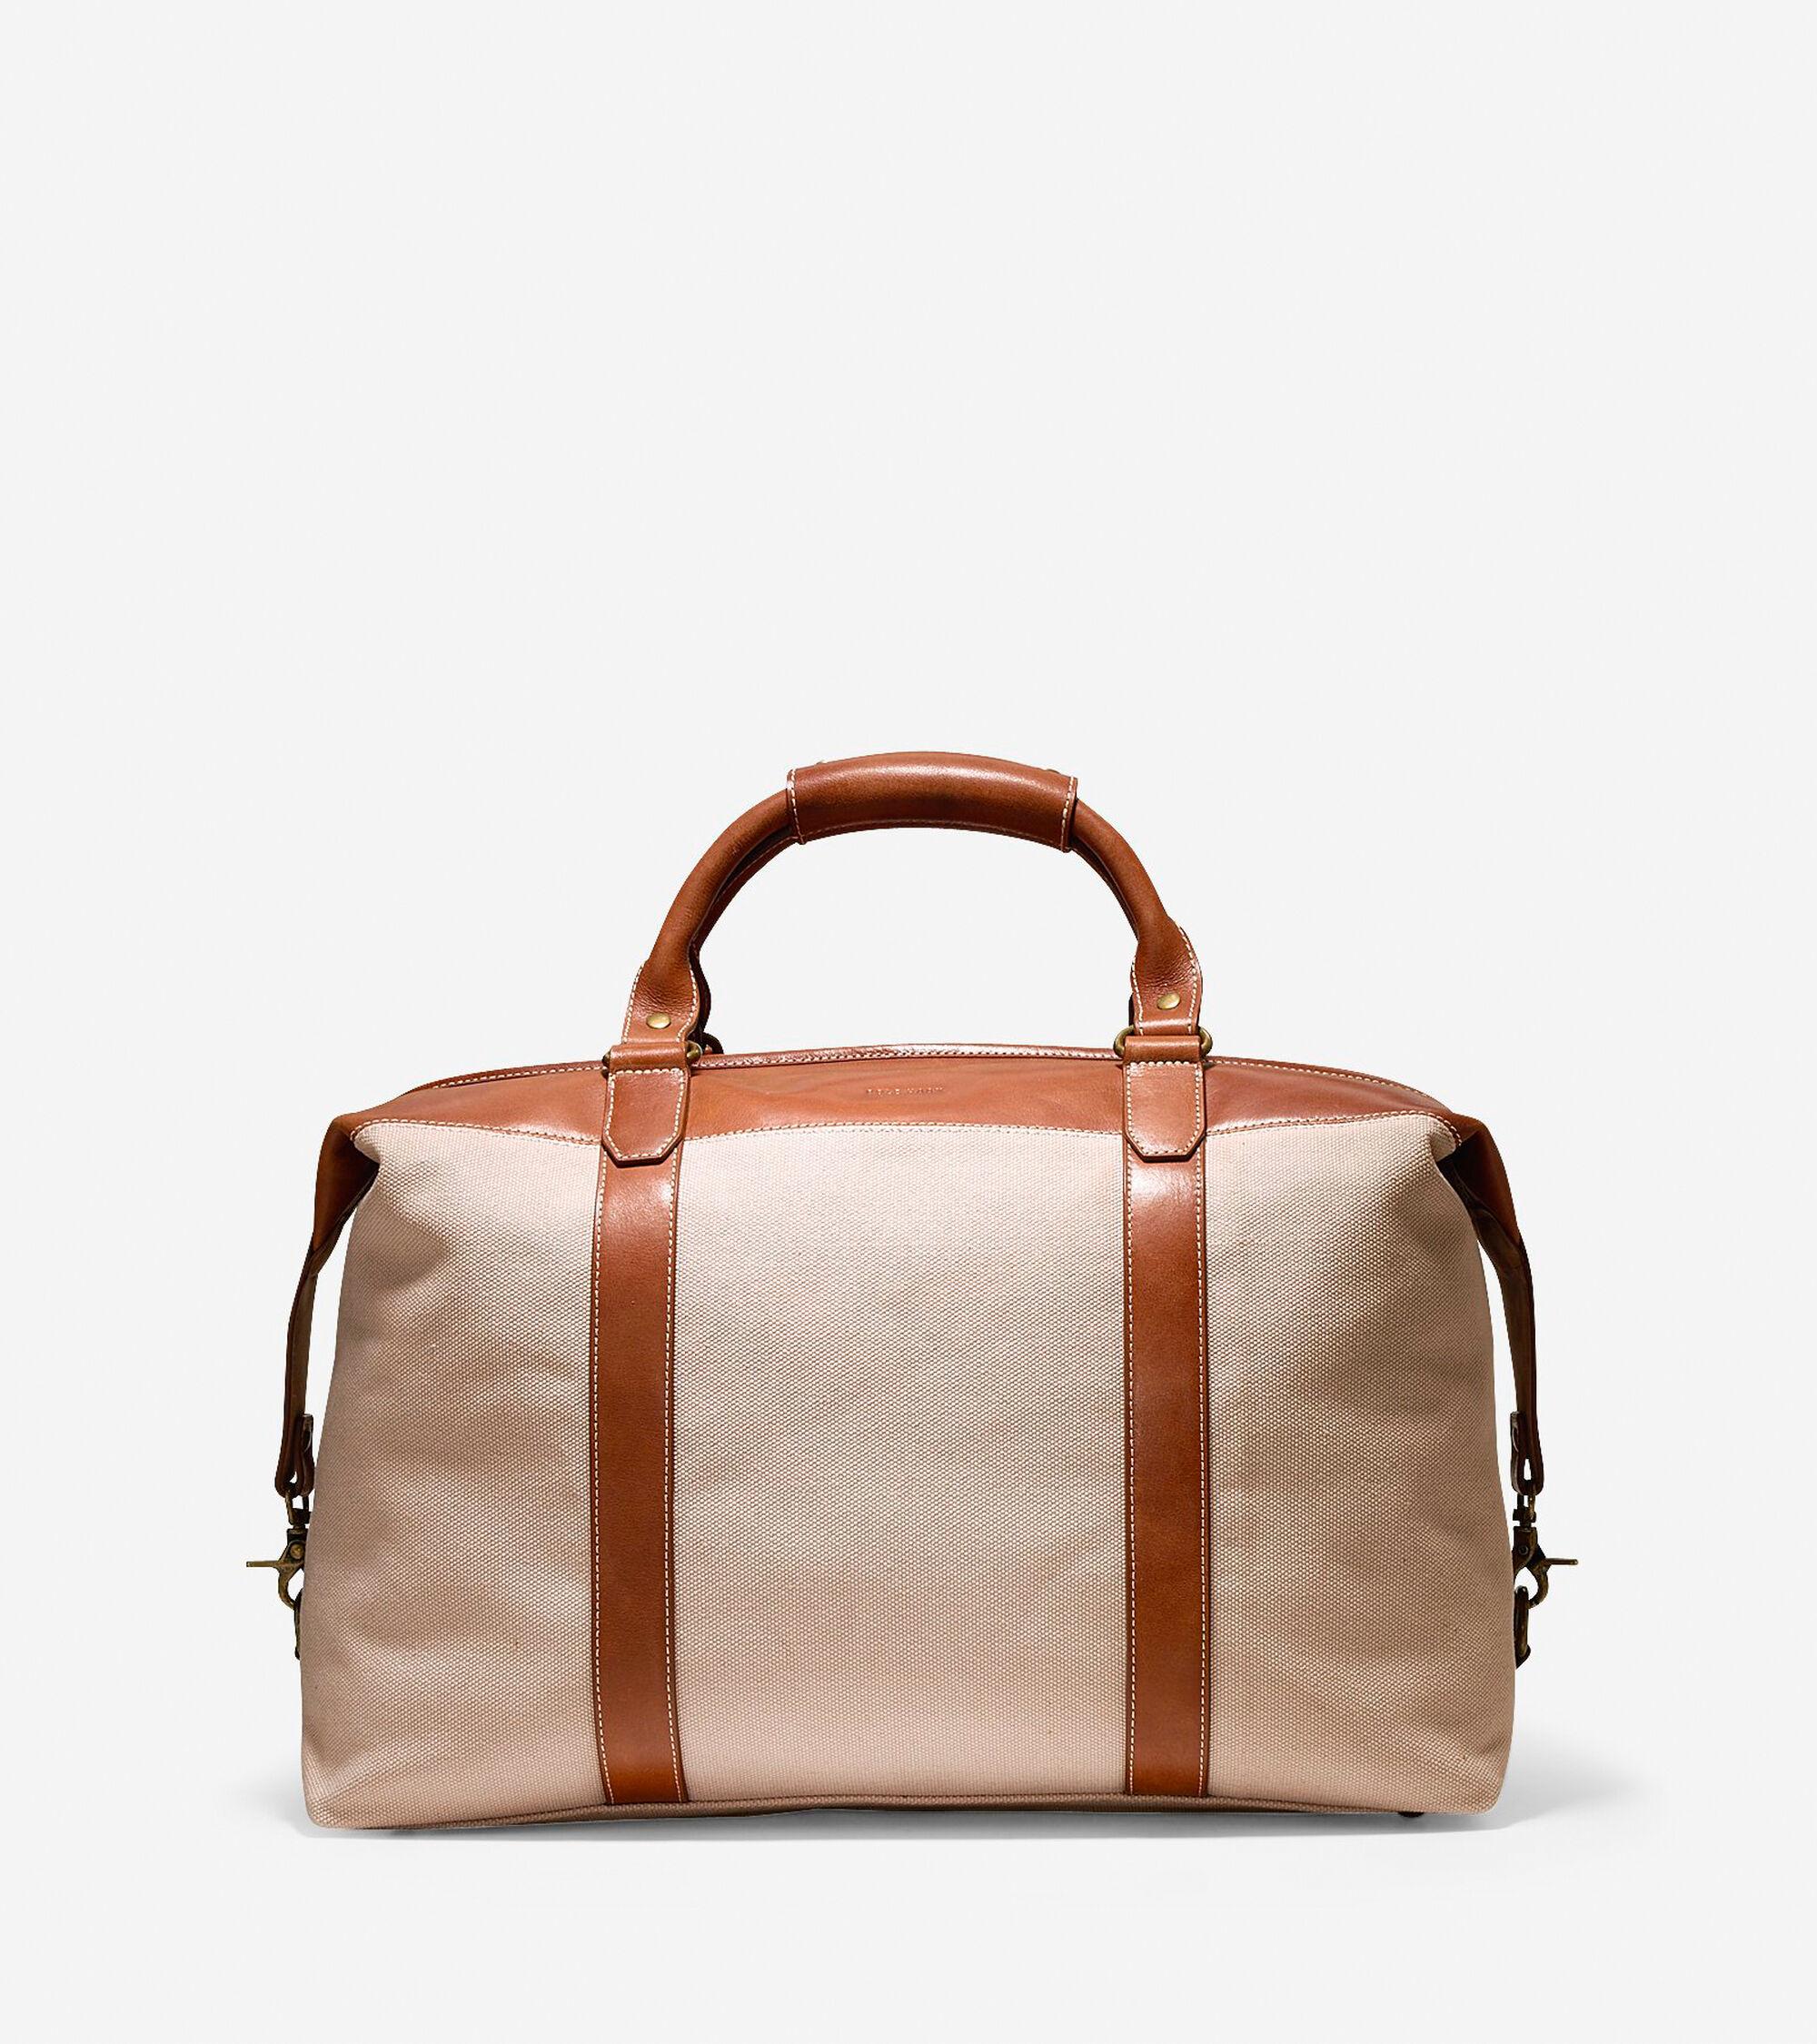 0b5e31e8c187 Longchamp Travel Duffel Bag Womens